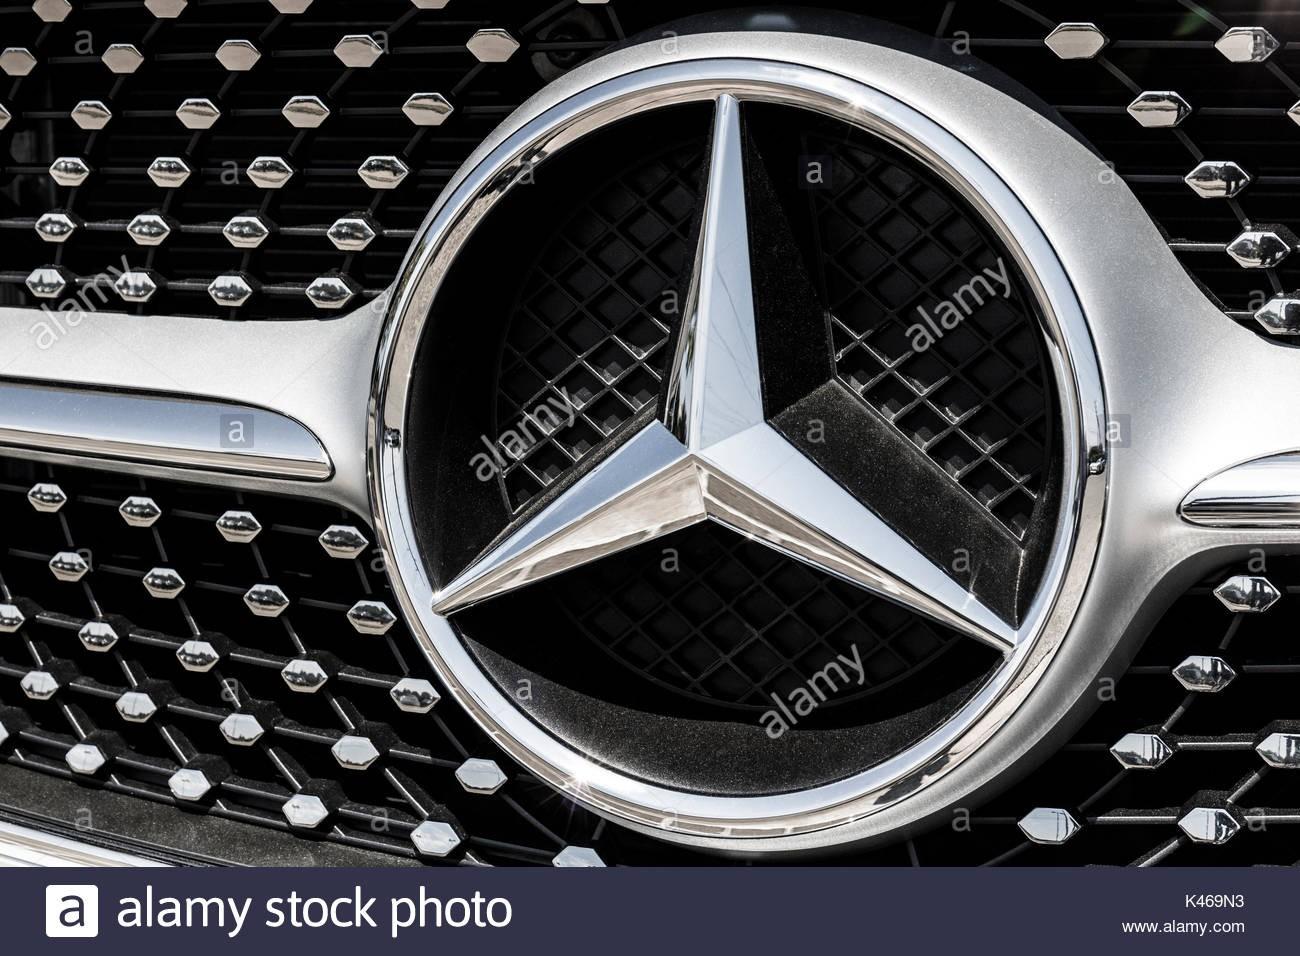 Logos - Marques de voitures